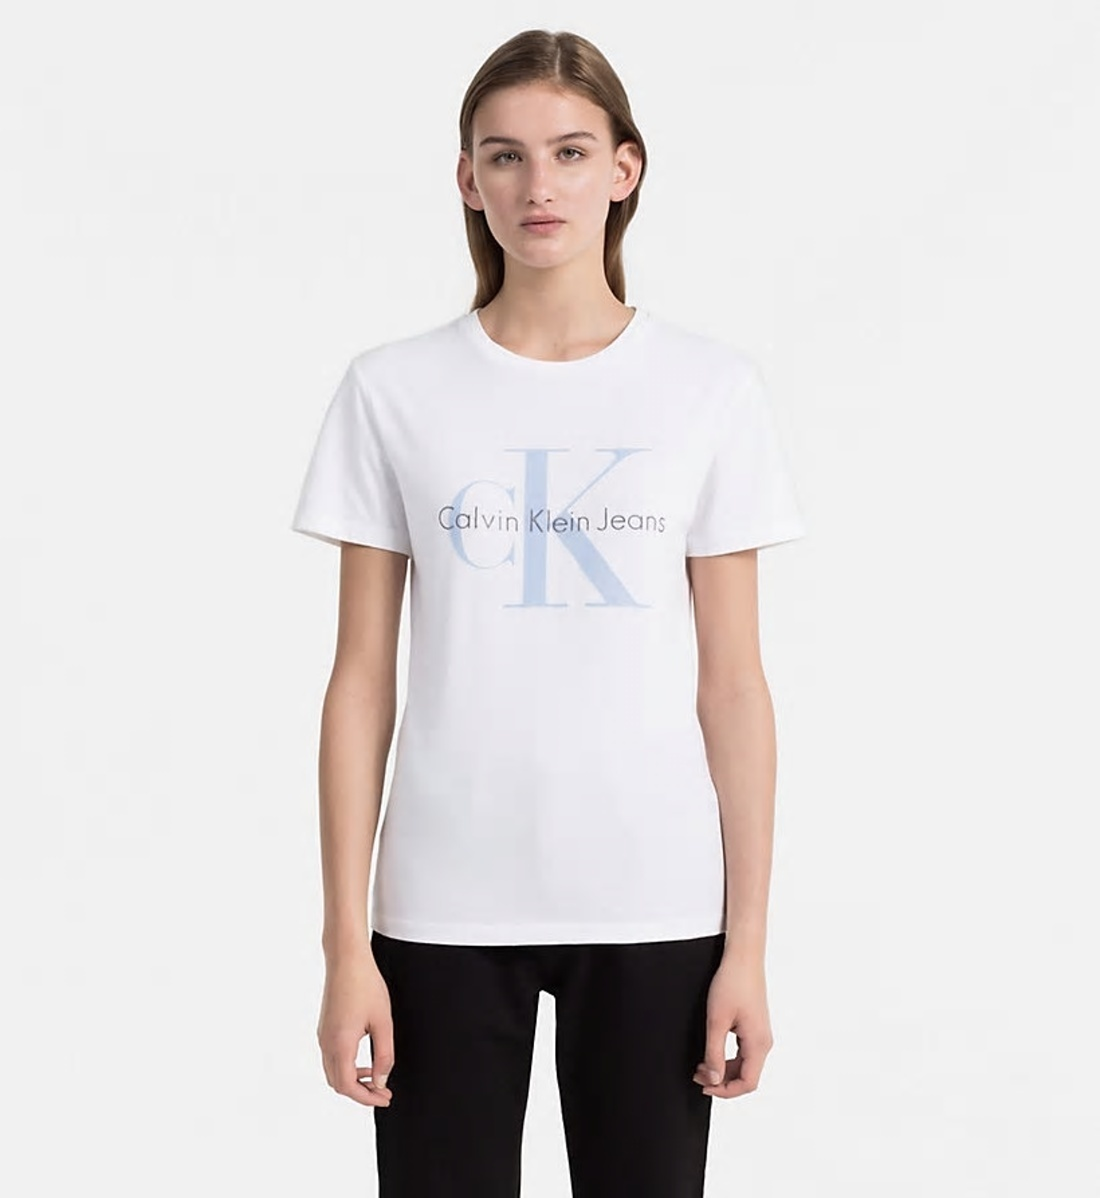 7ddf91620 Calvin Klein dámské bílé tričko - Mode.cz